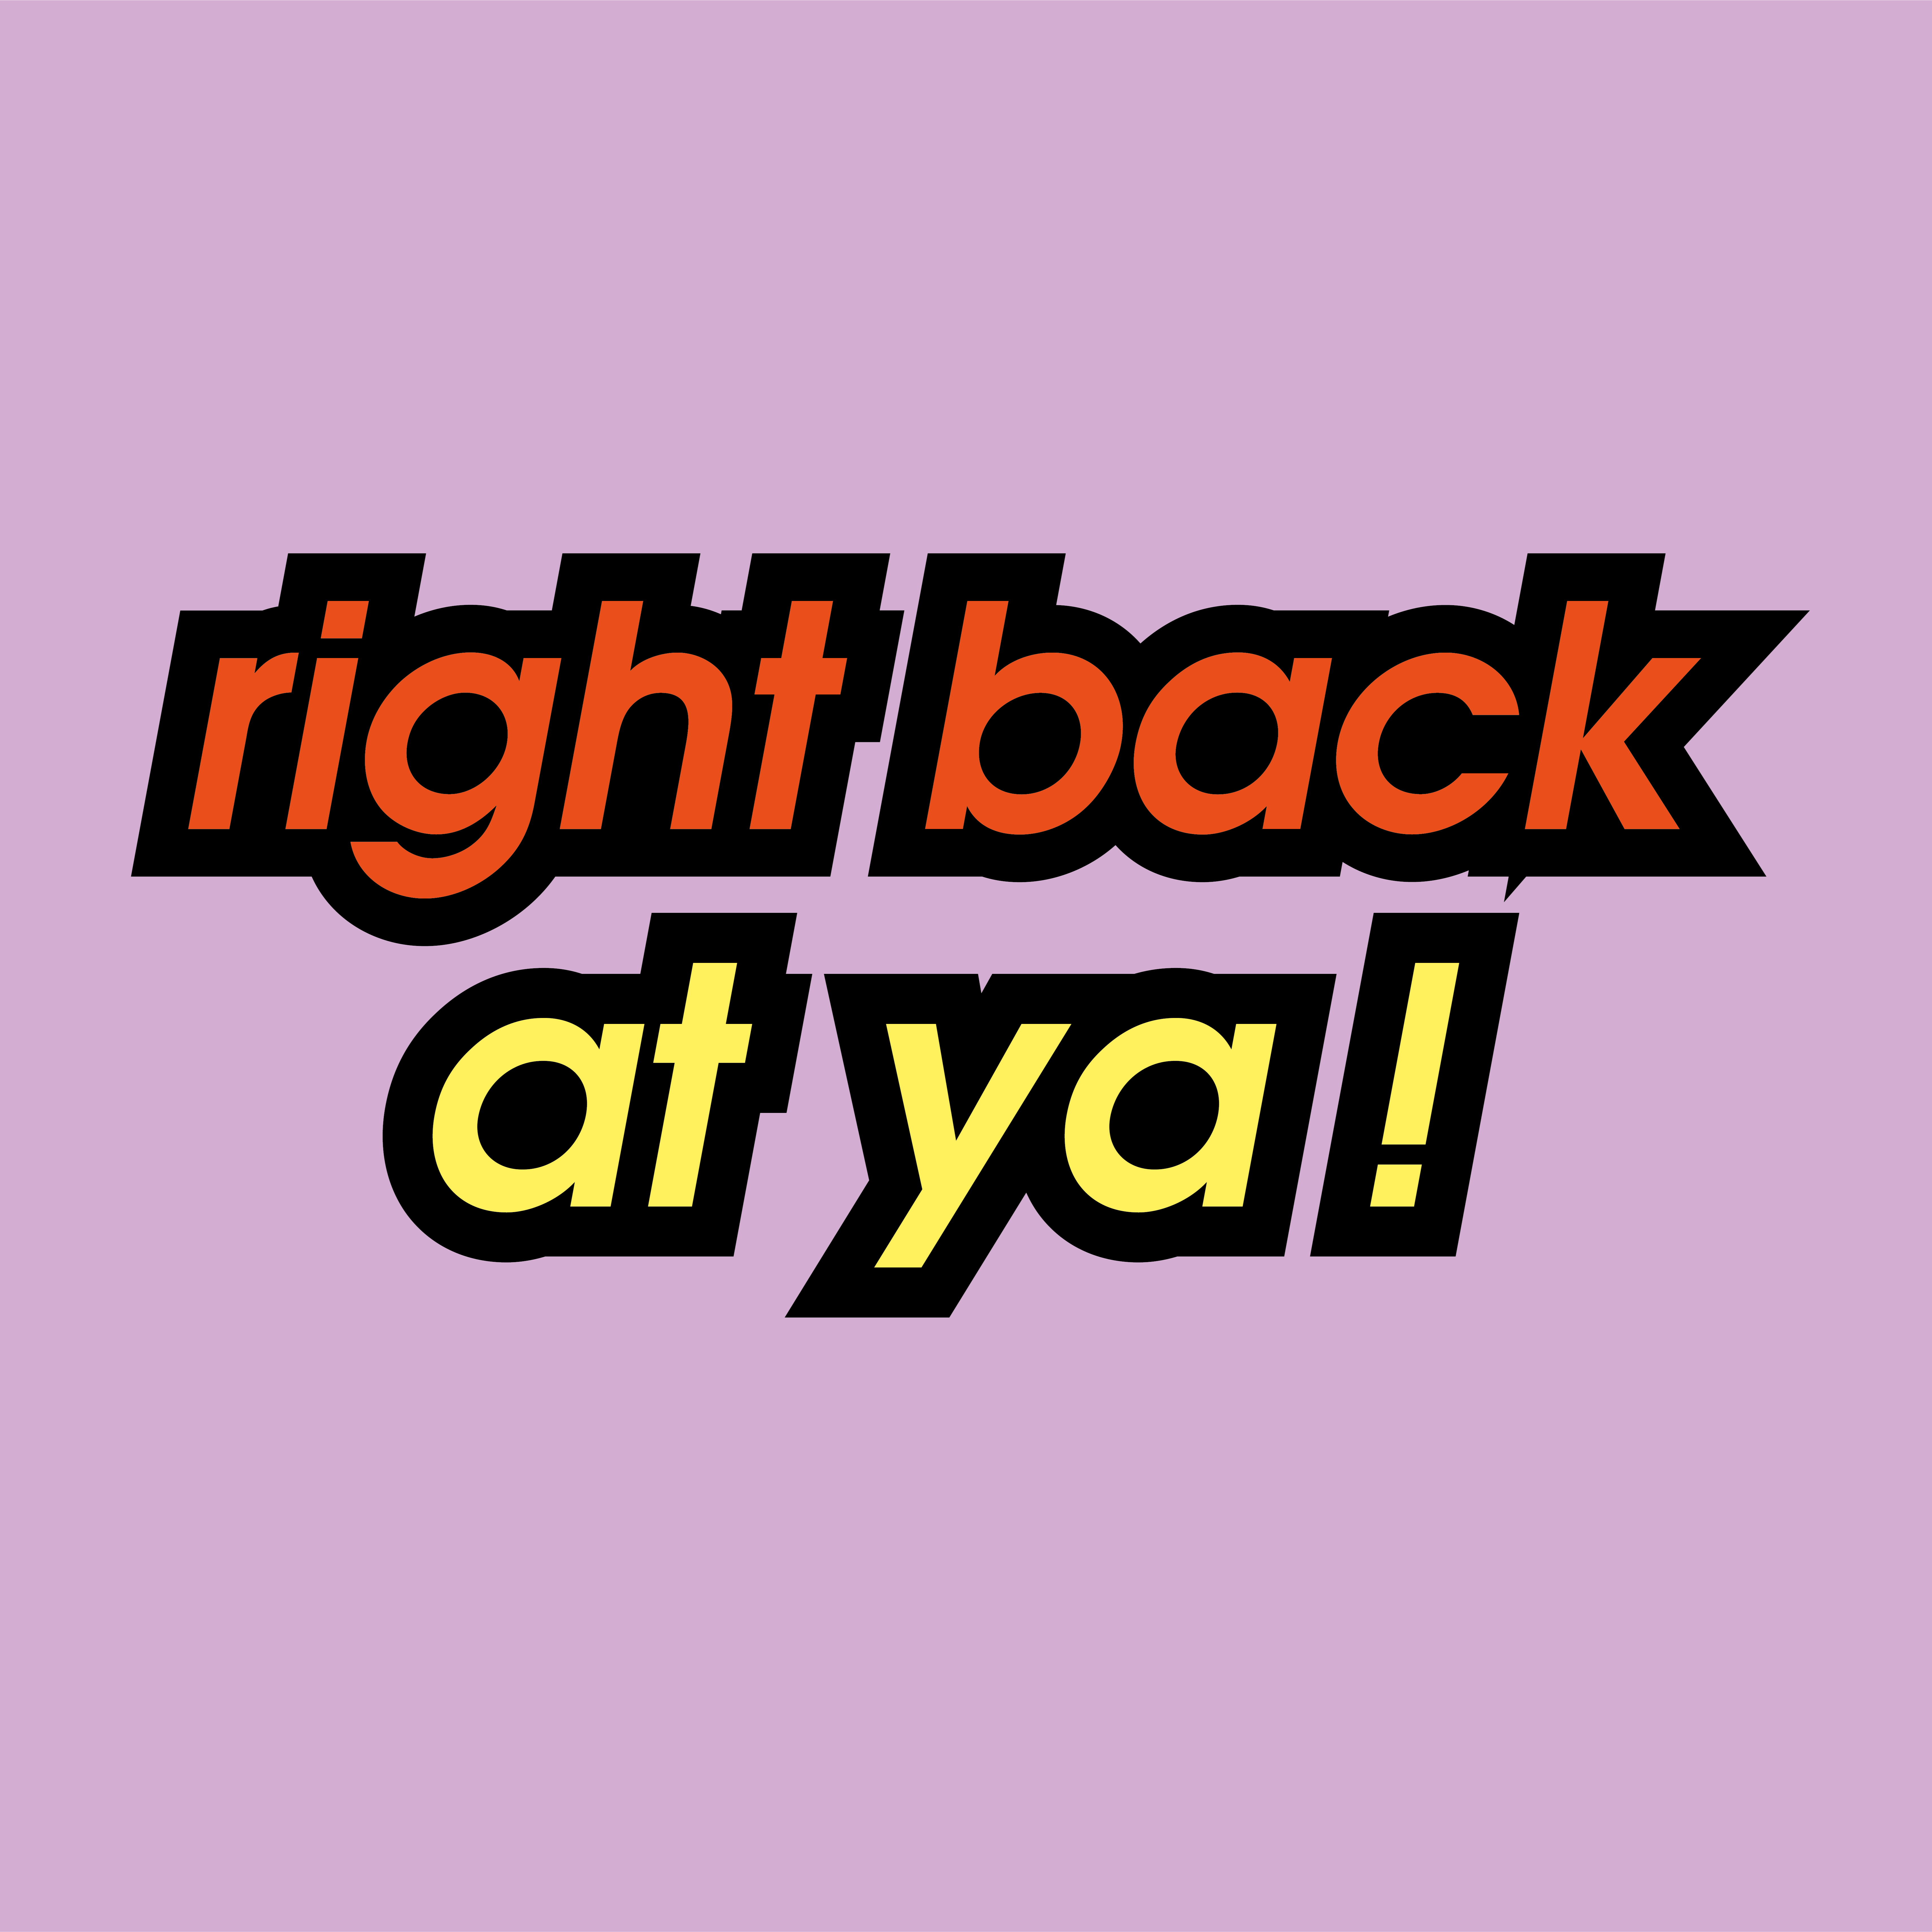 @rightbackpod Profile Image | Linktree